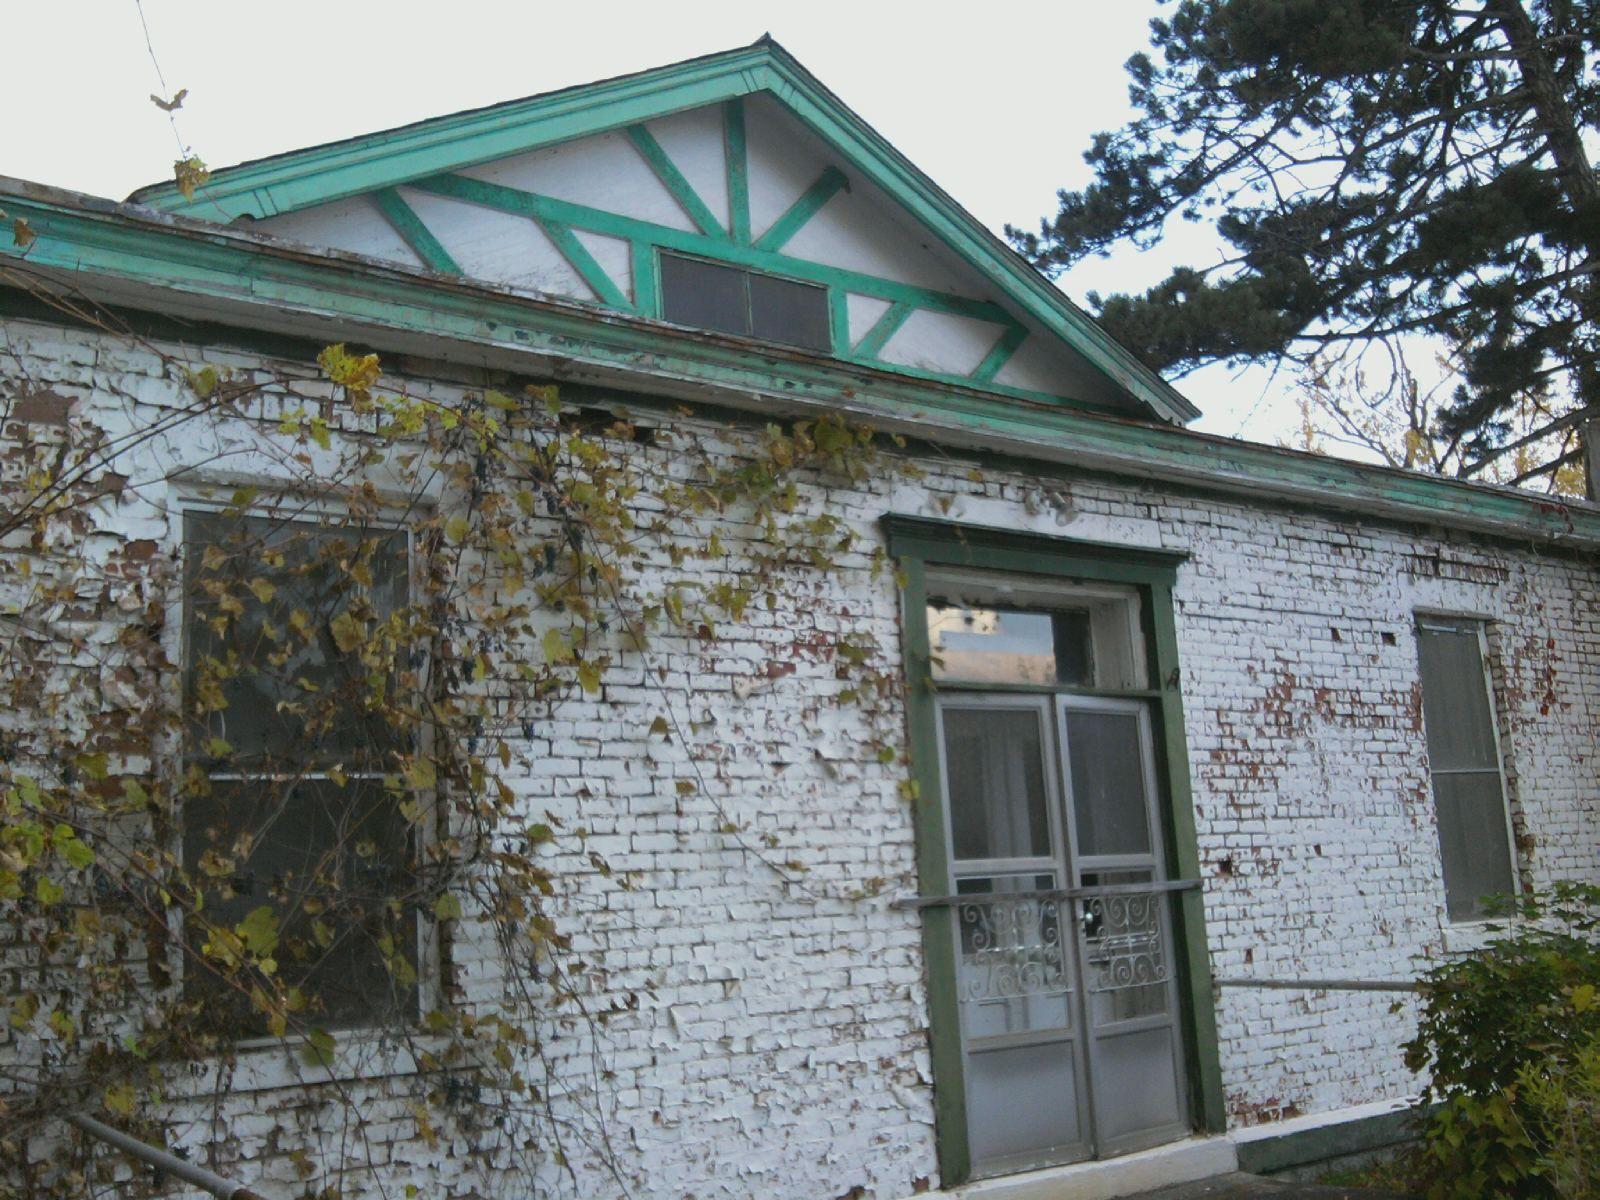 Imperial Bathhouse Sharon springs